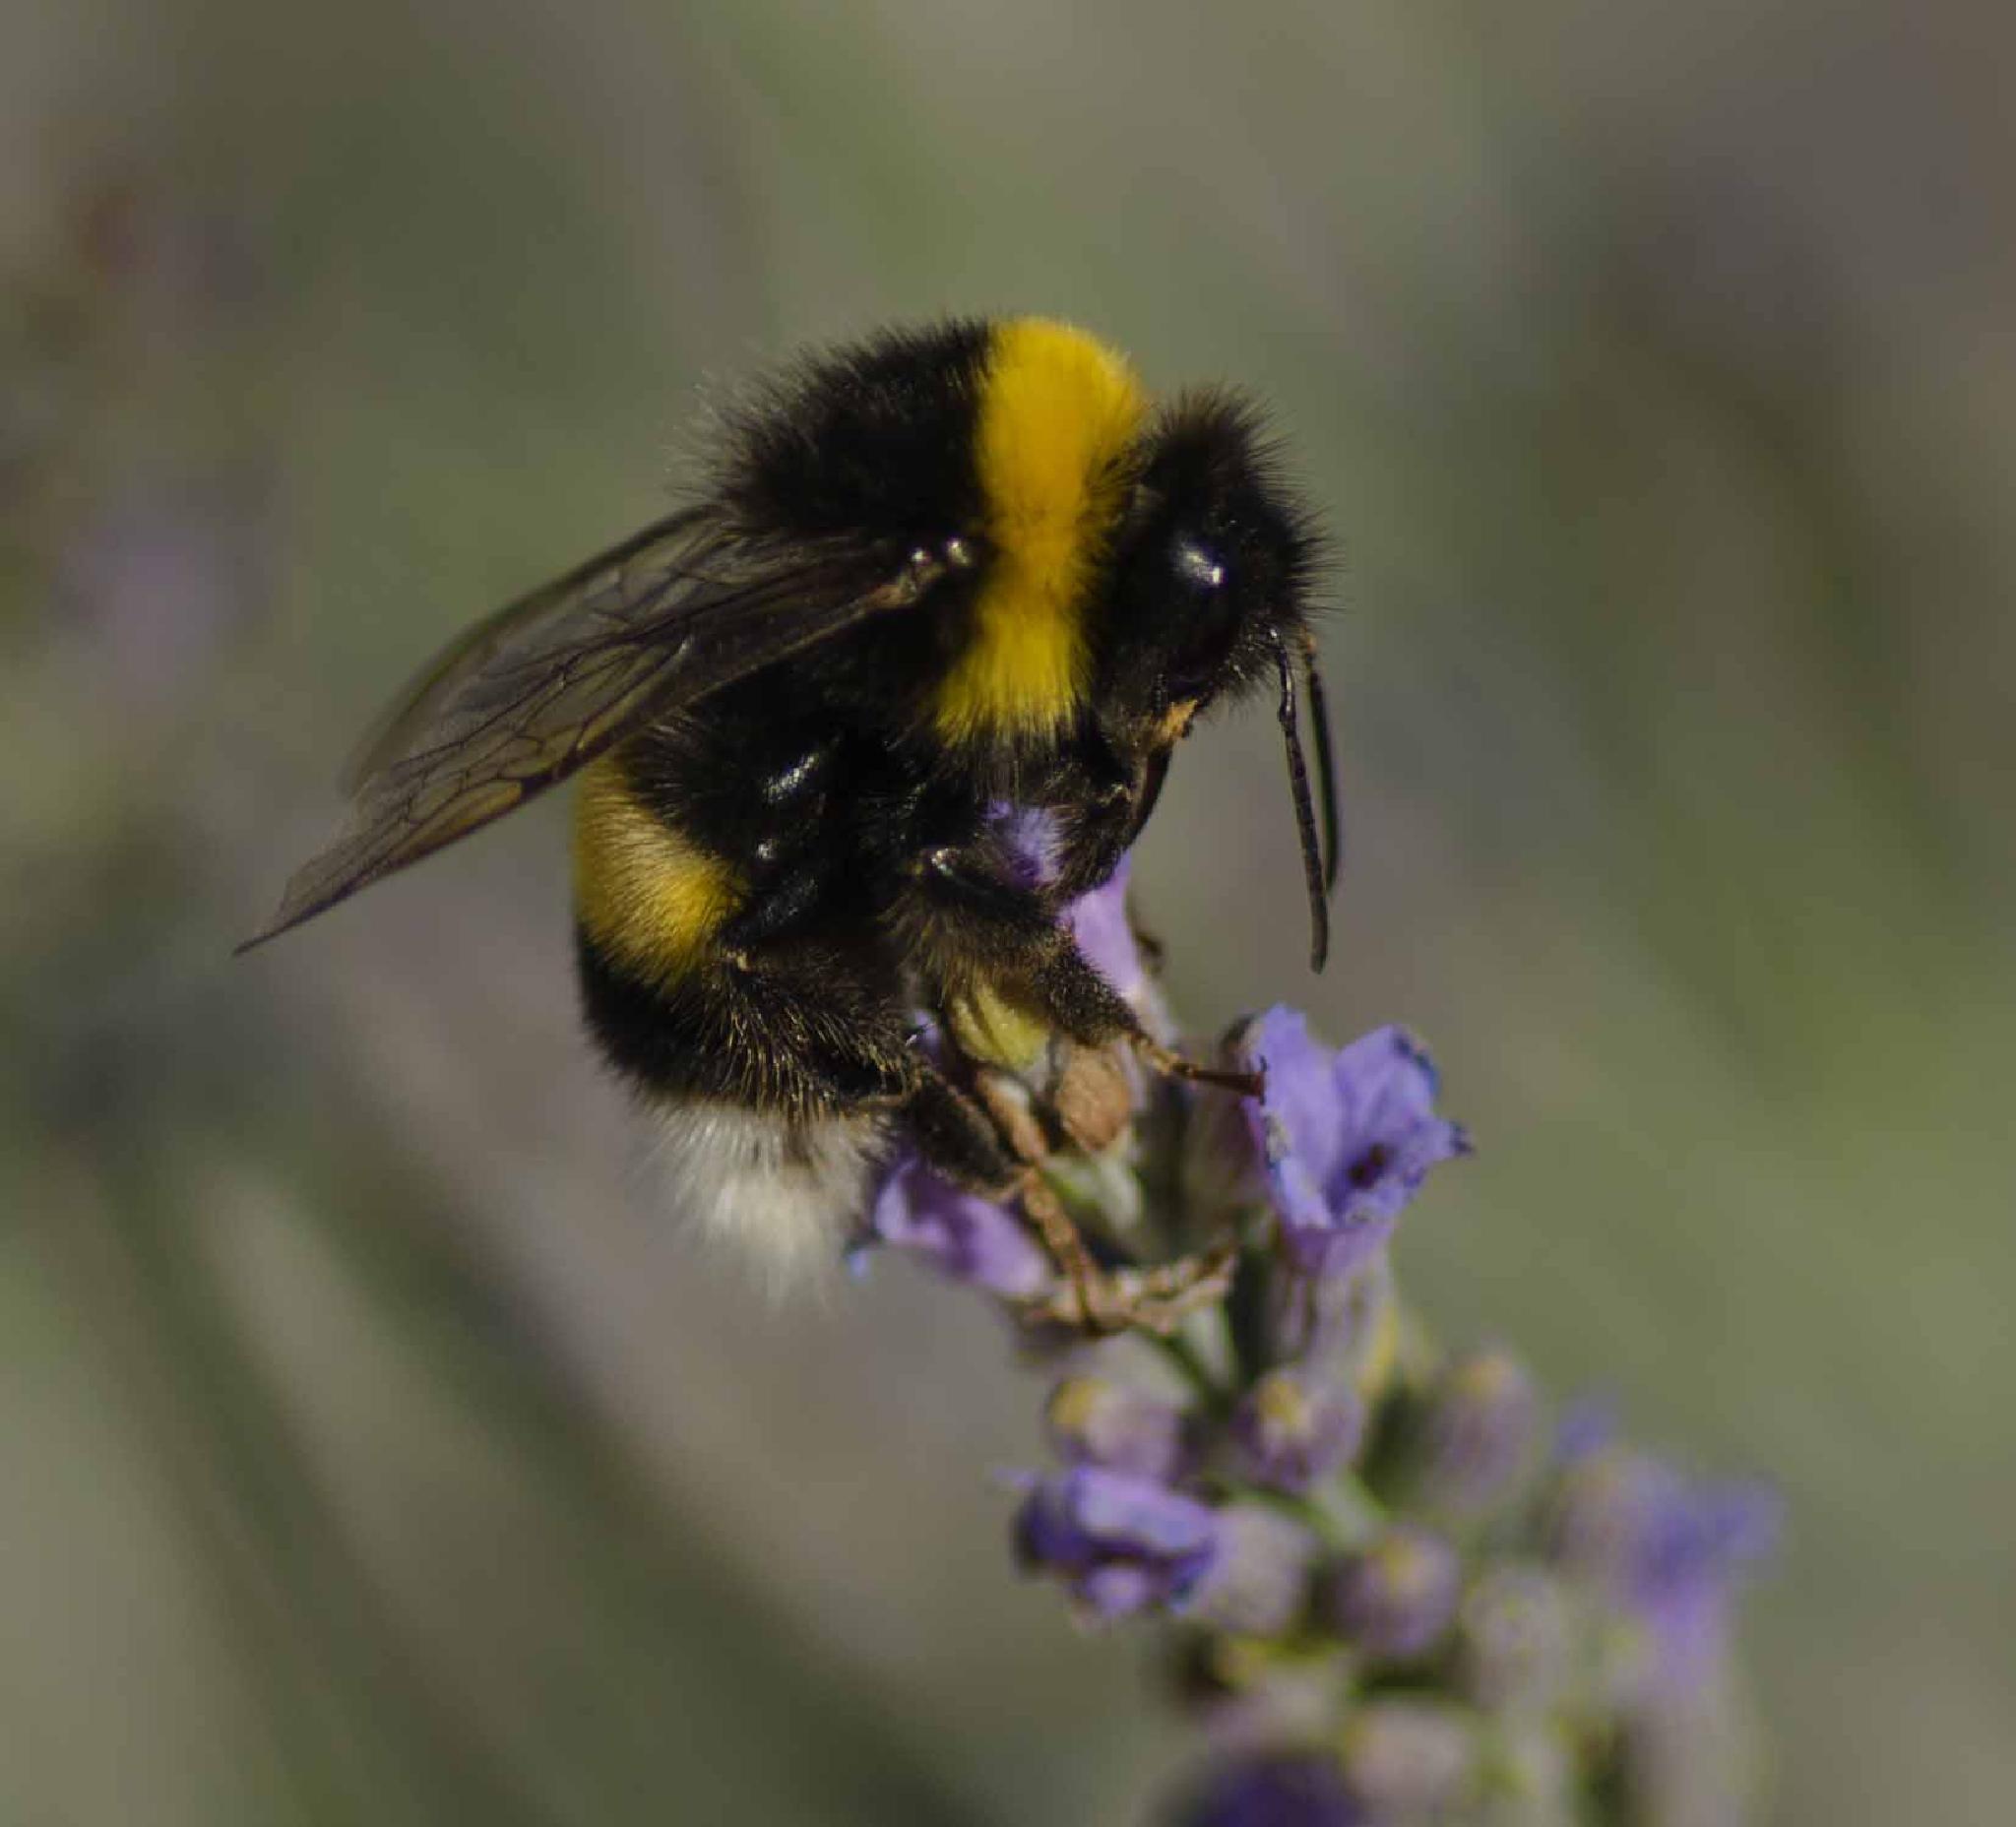 Bee landing to get nextar by nnpstom